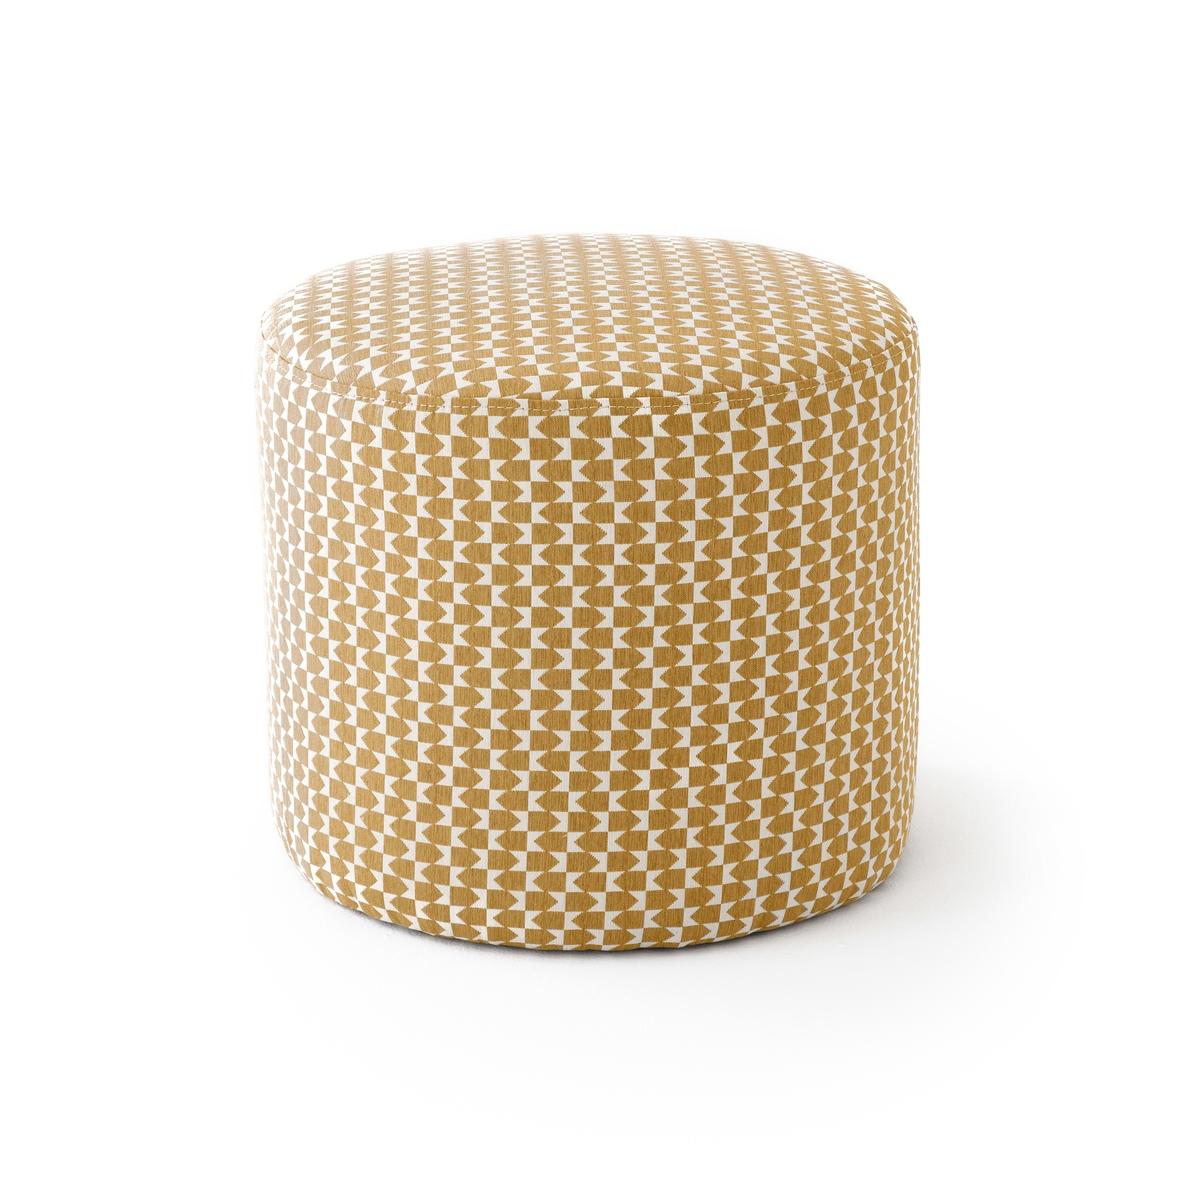 Пуф LaRedoute Из ткани SMON единый размер желтый